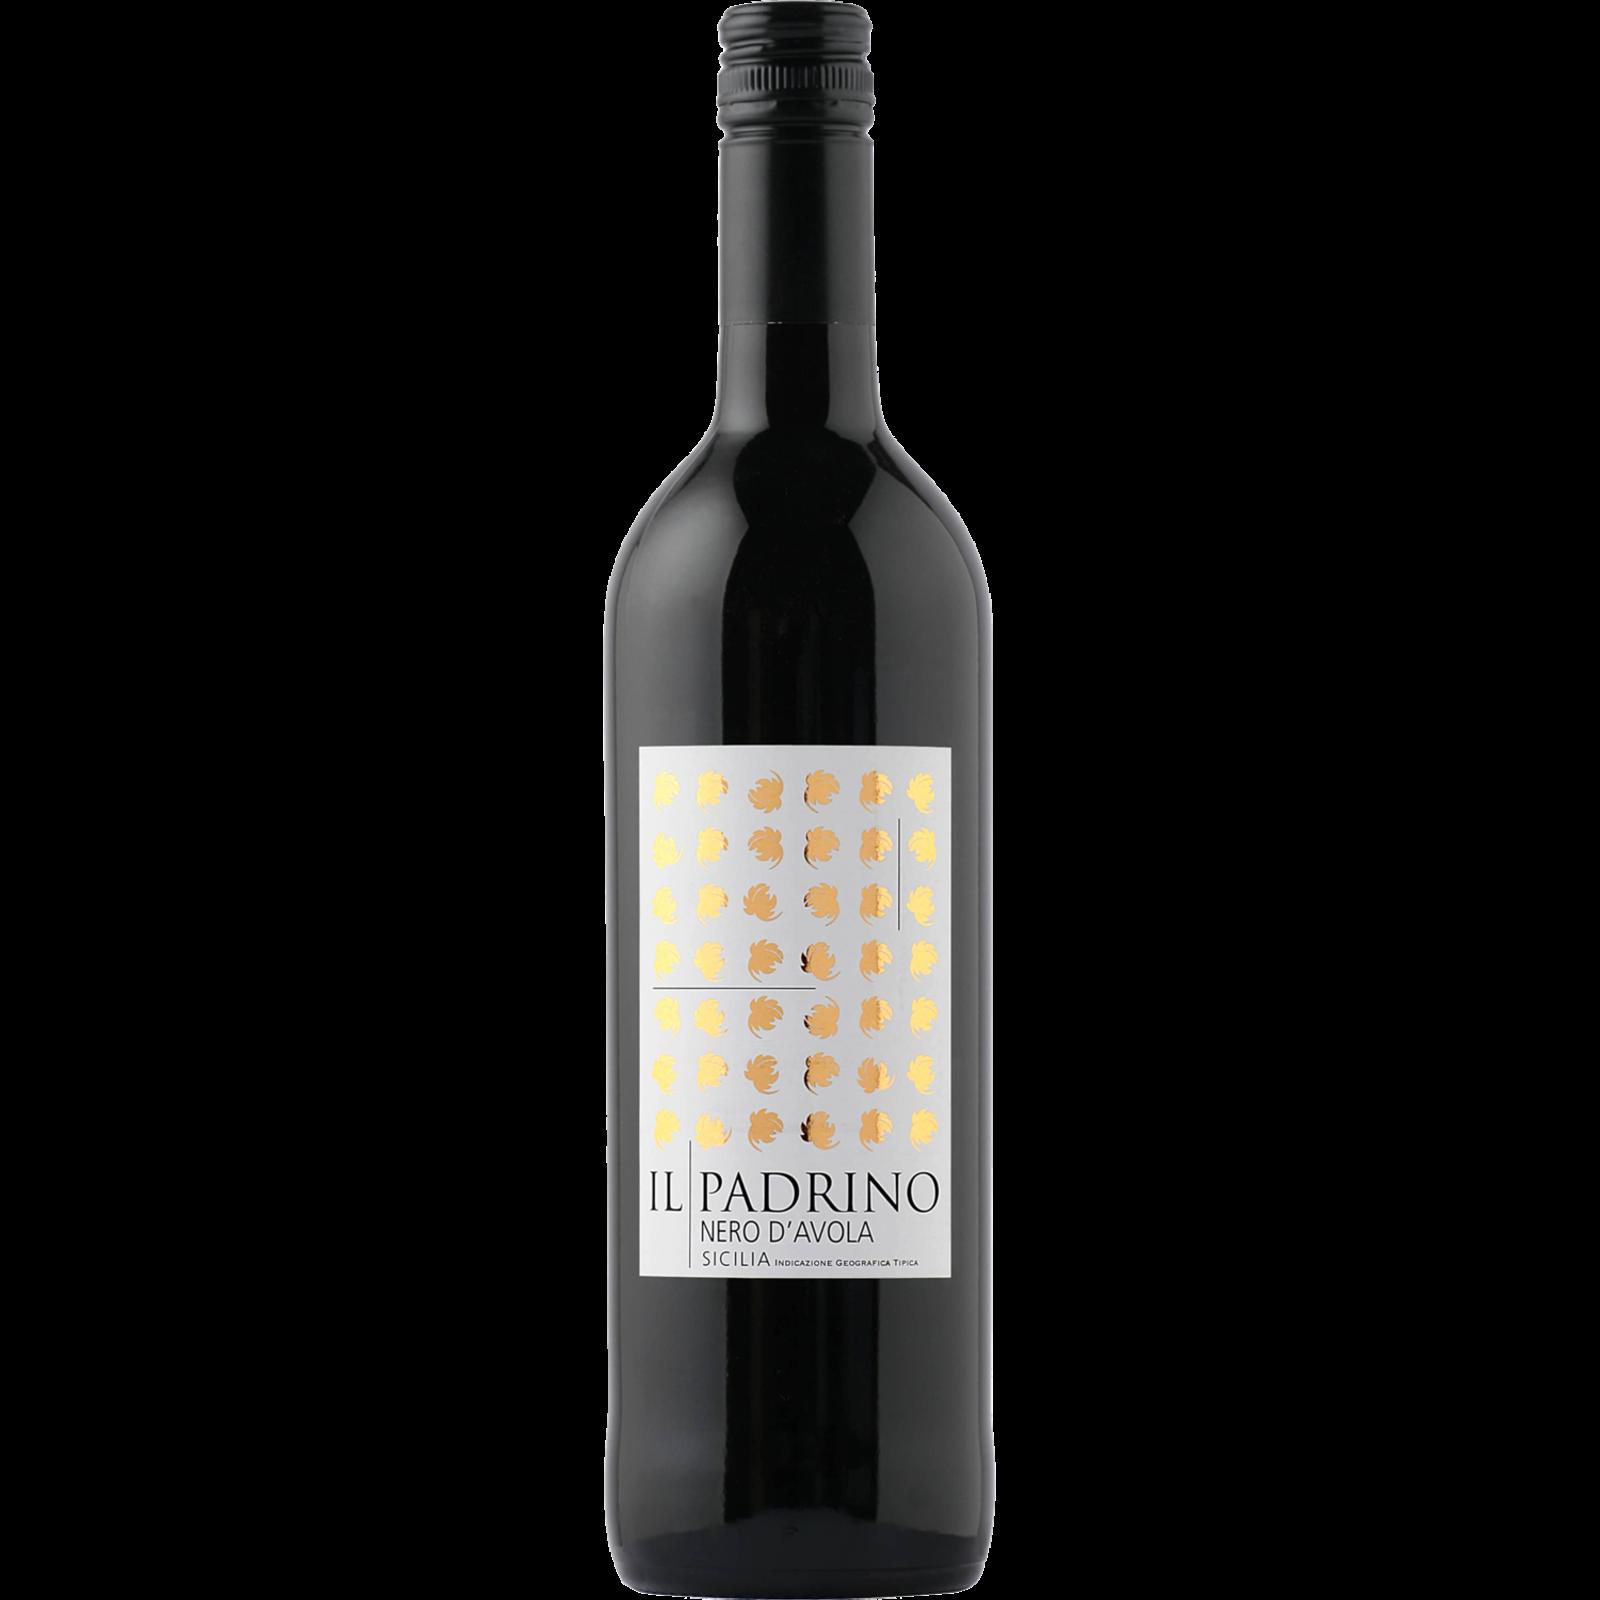 Mondo Del Vino Il Padrino Nero d'Avola Terre Siciliane 2019